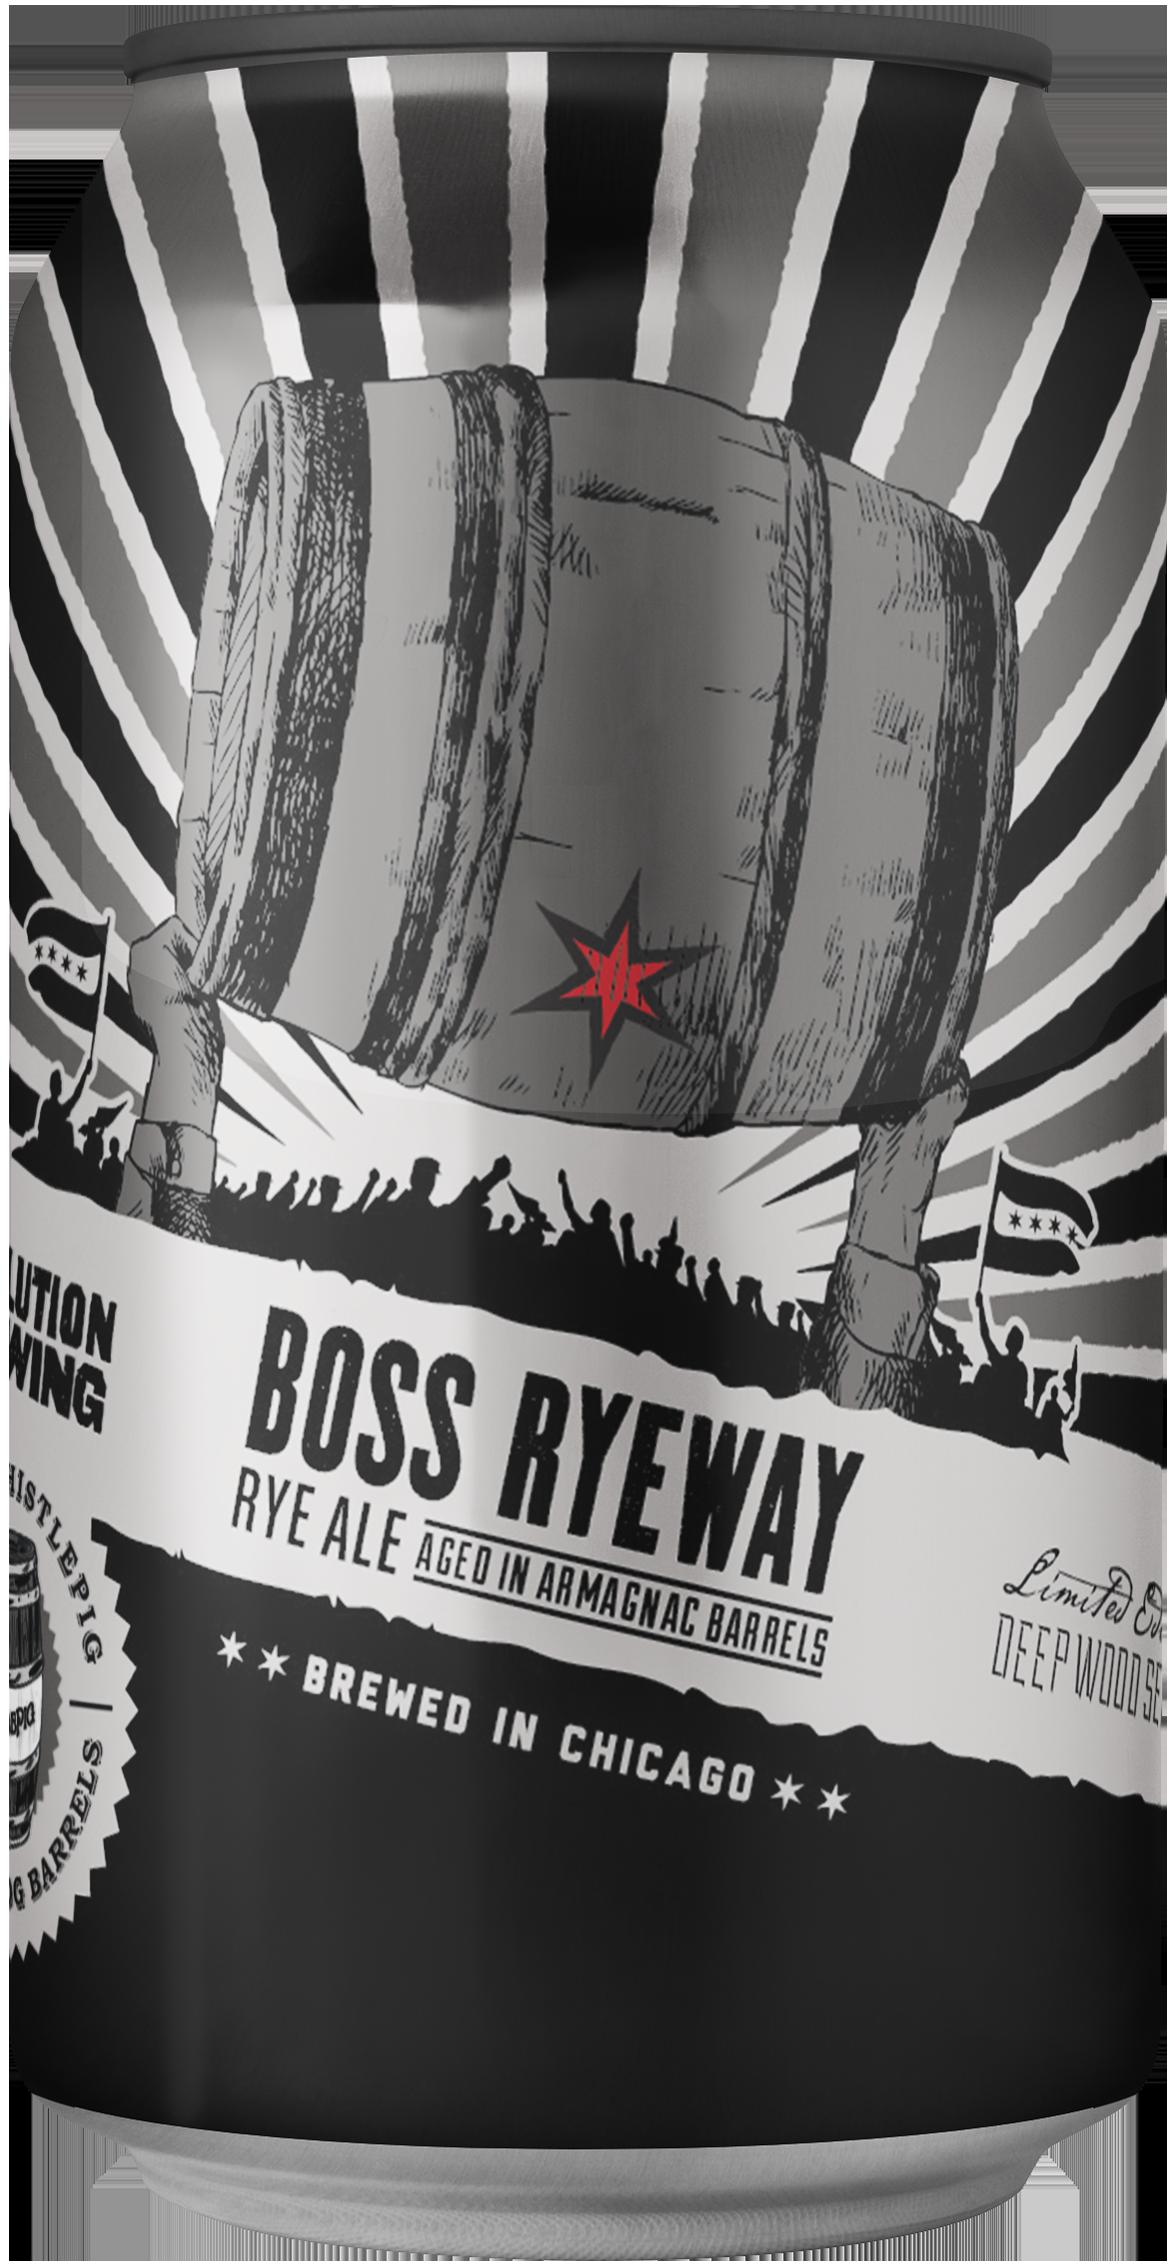 BossRyeway.Web2.png